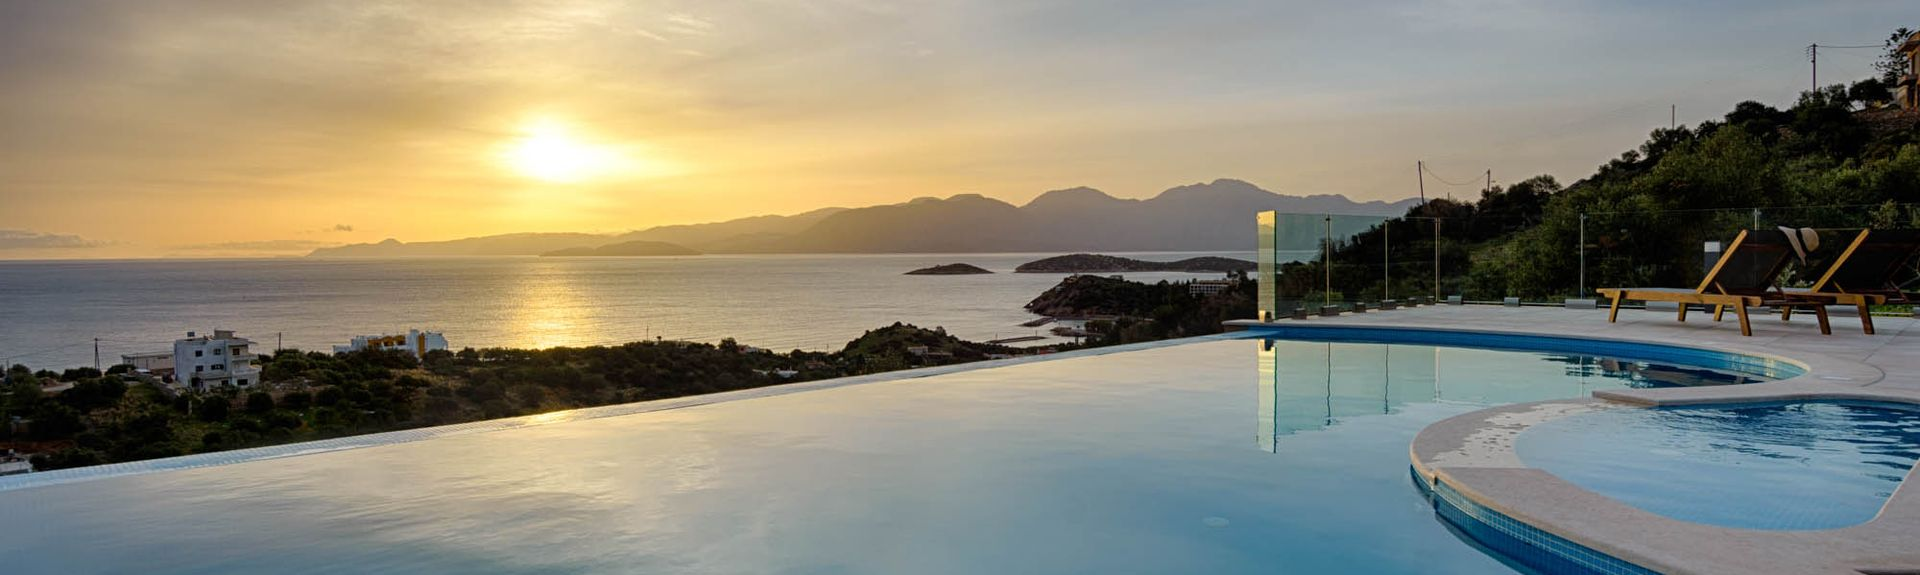 Stalis Strand, Hersonissos, Kreta, Grækenland